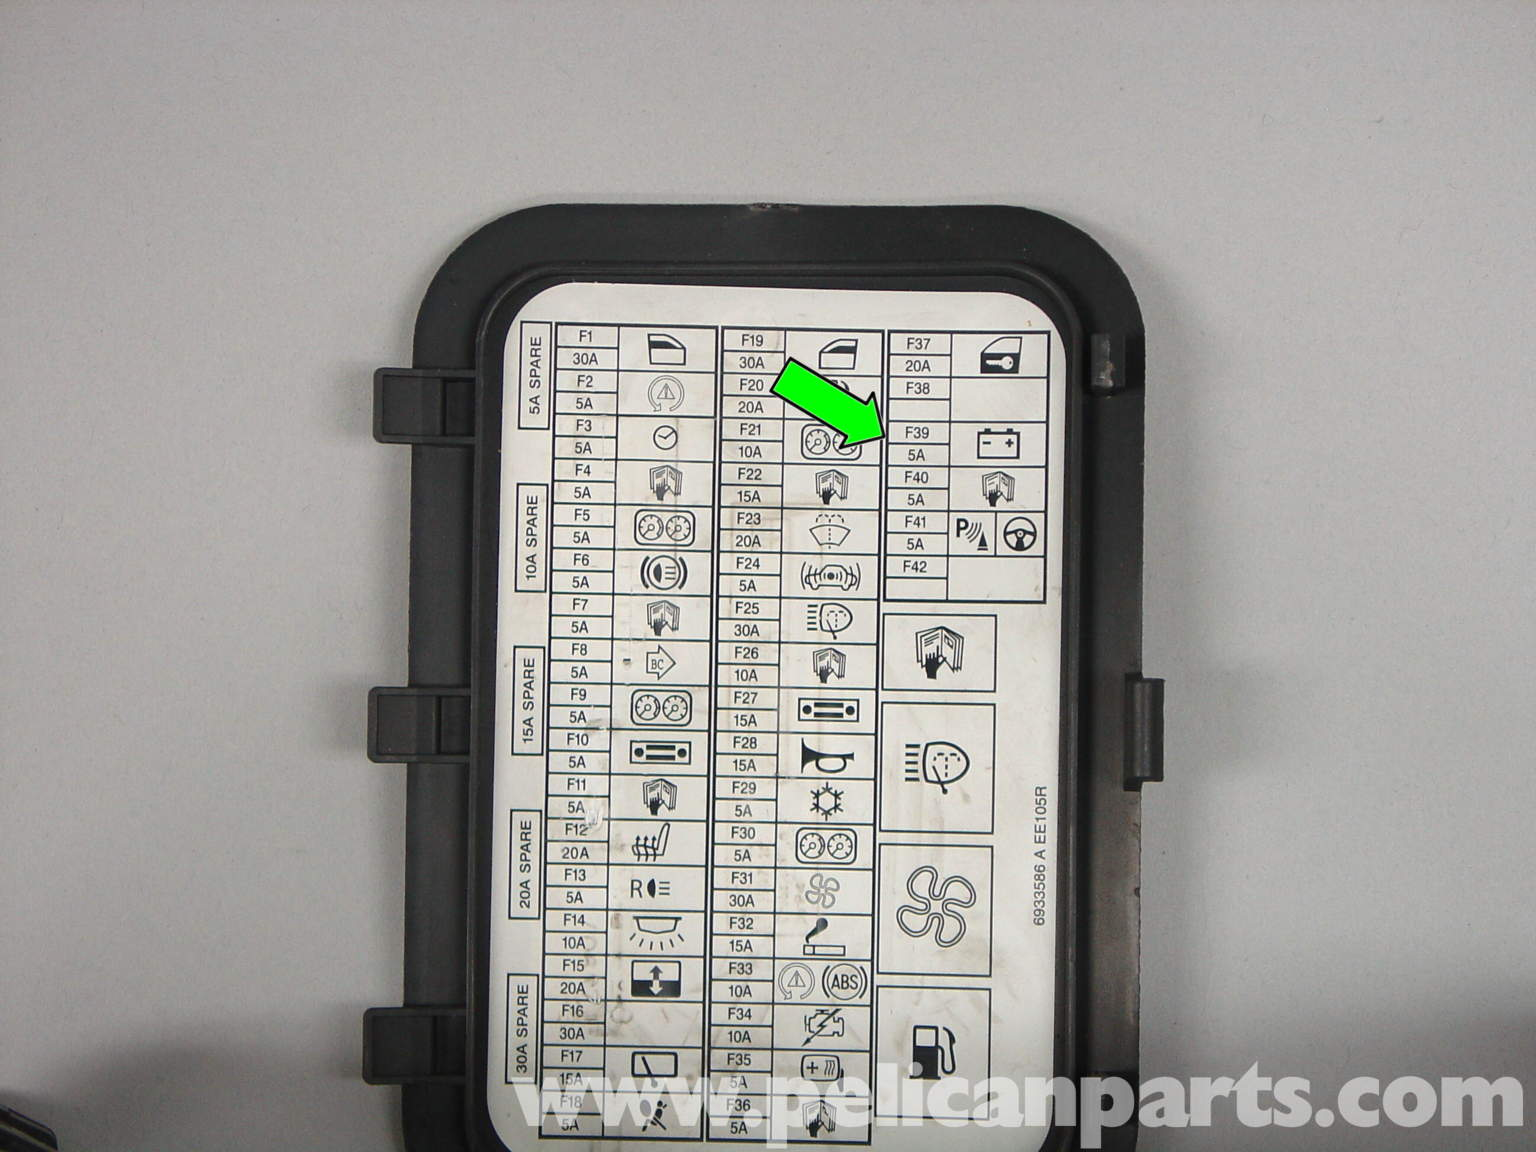 hight resolution of mini cooper headlight wiring diagram mini image nokia phone charger circuit diagram wirdig on mini cooper